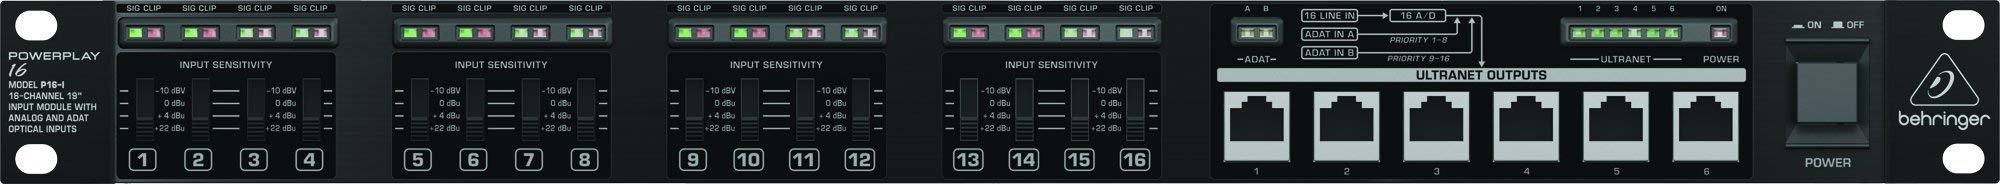 Powerplay P16-I 16-Channel ADA Converter